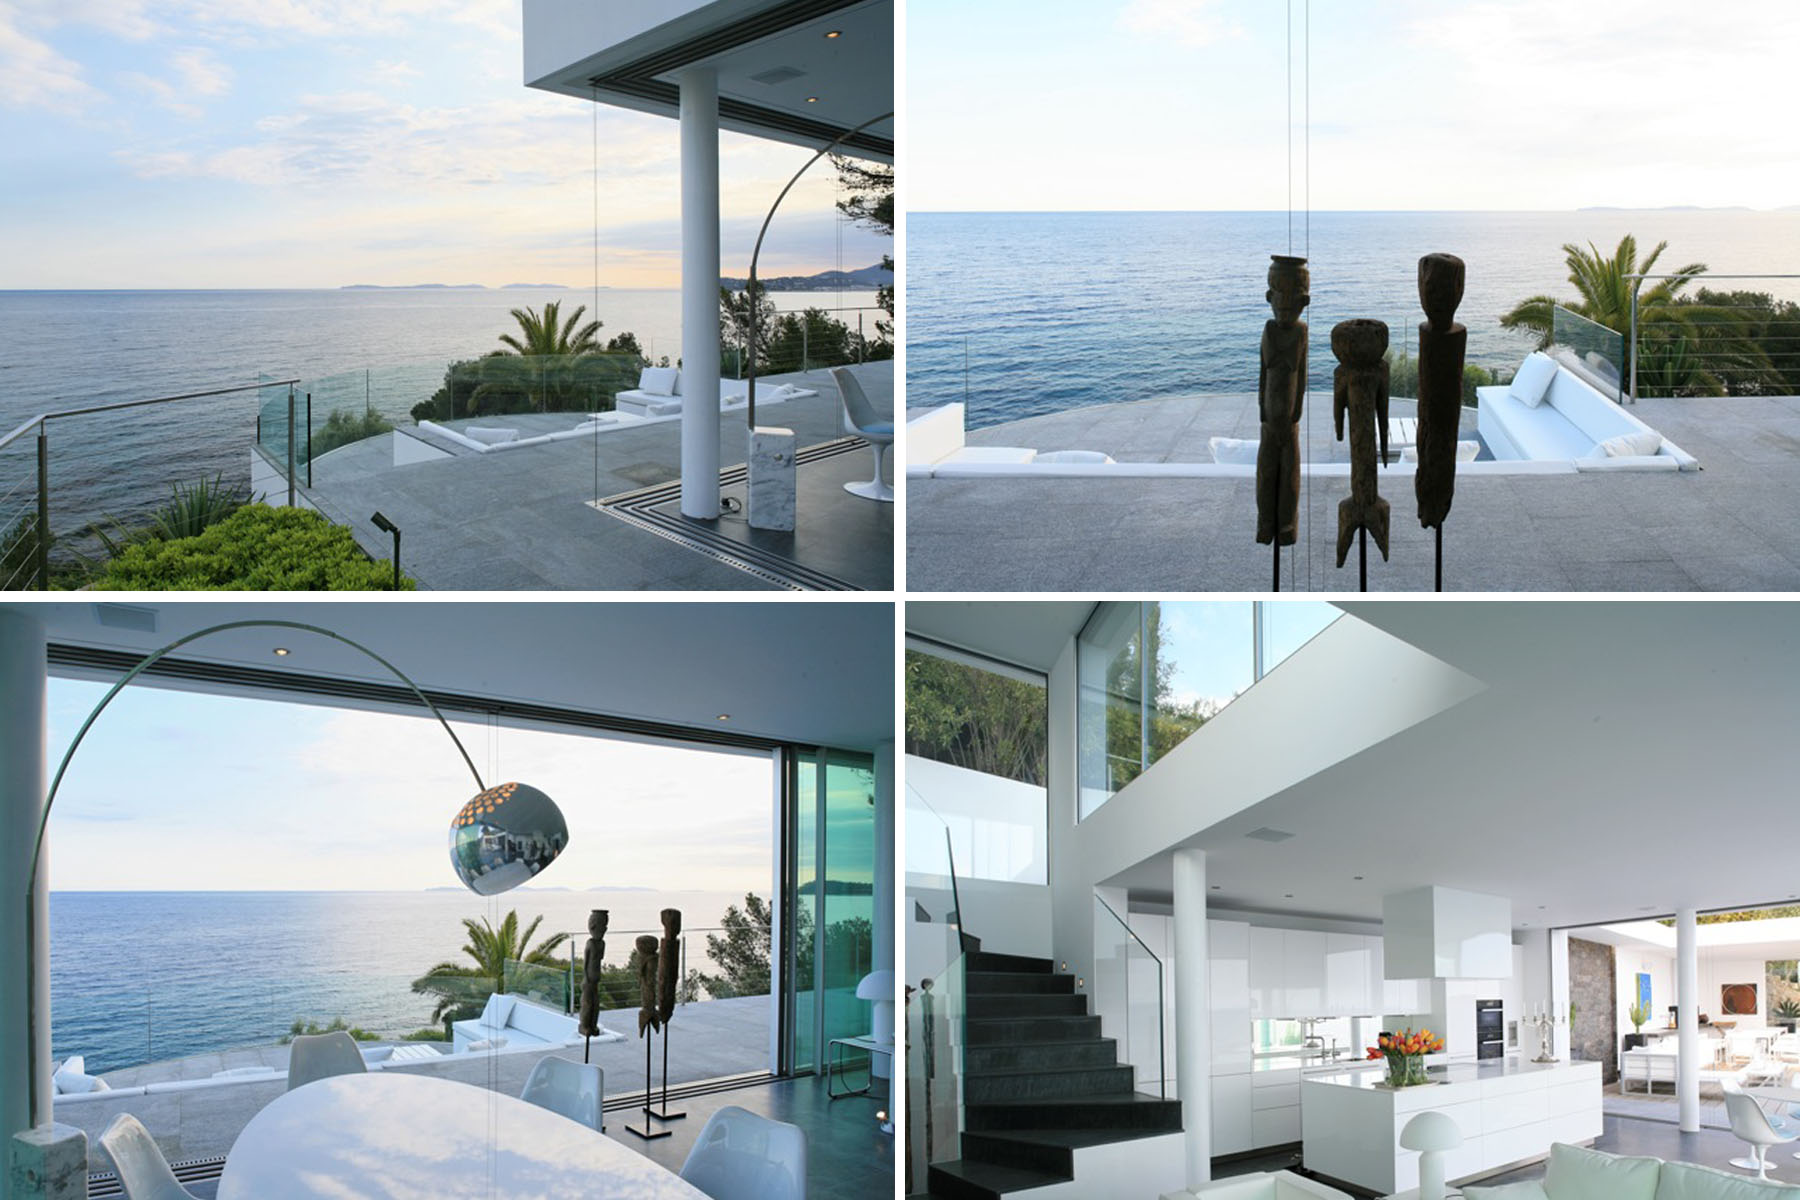 G1_Florence_Watine_Architecte_Designer_Decoratrice_Paris_France_Villa_Sud_Bord_Mer